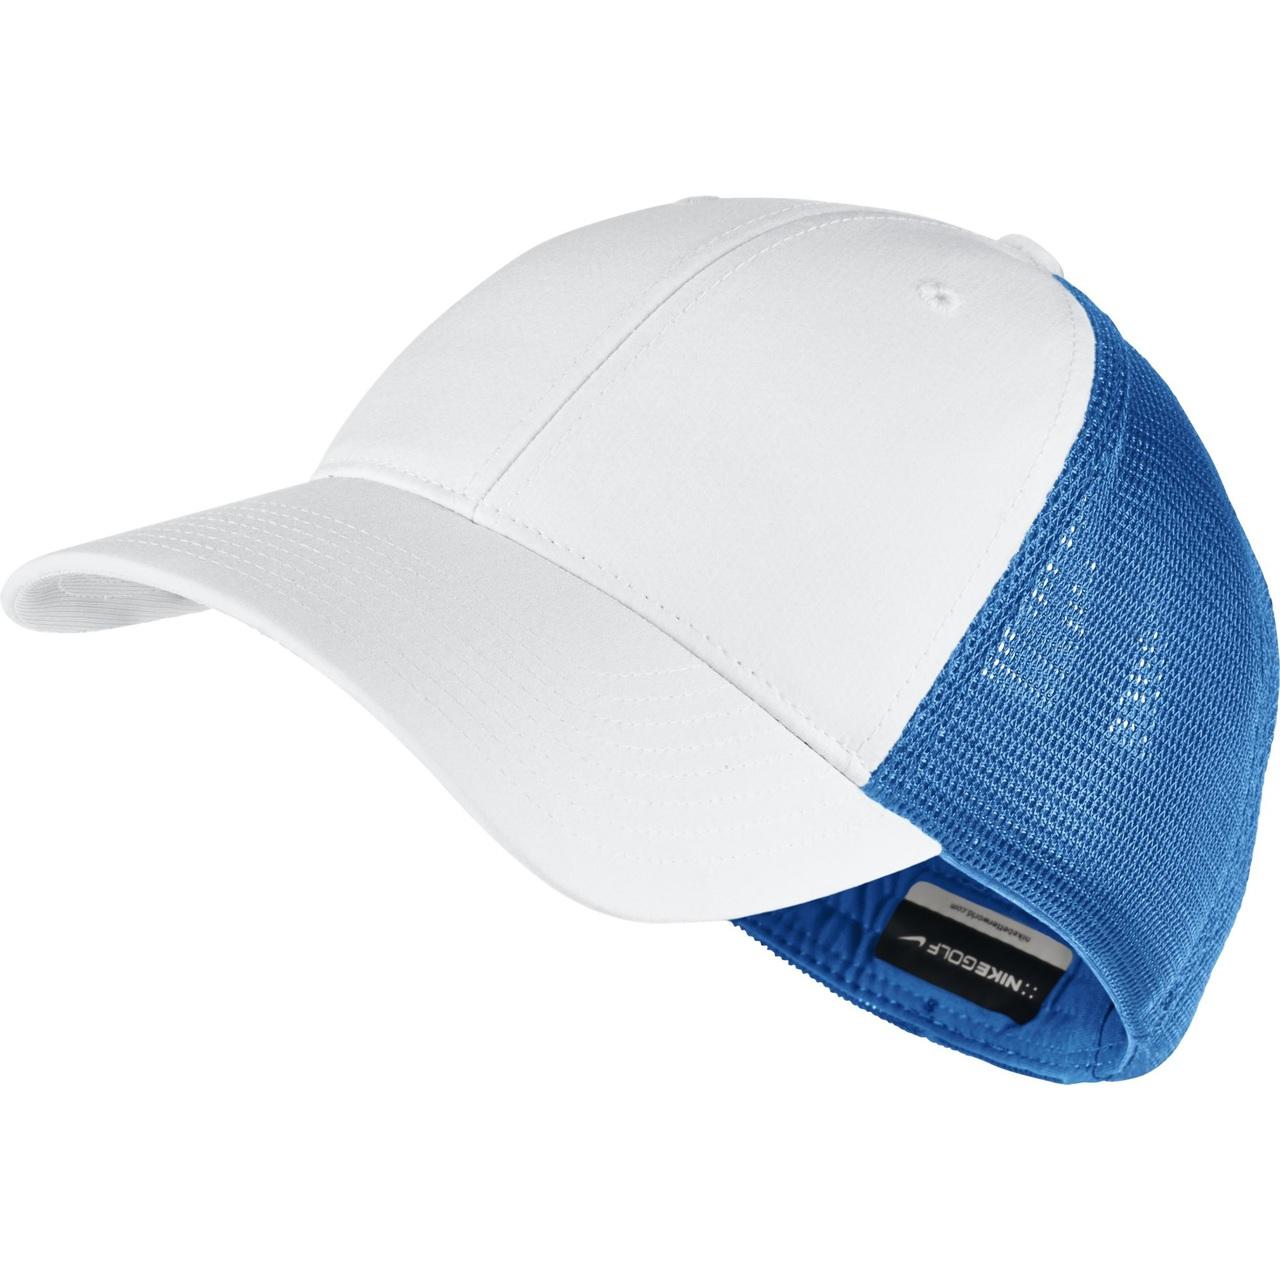 b29f6508 Nike Golf Legacy 91 Mesh Custom Hat (Midnight Navy/White) S/M - Photo  Blue/White/Anthracite